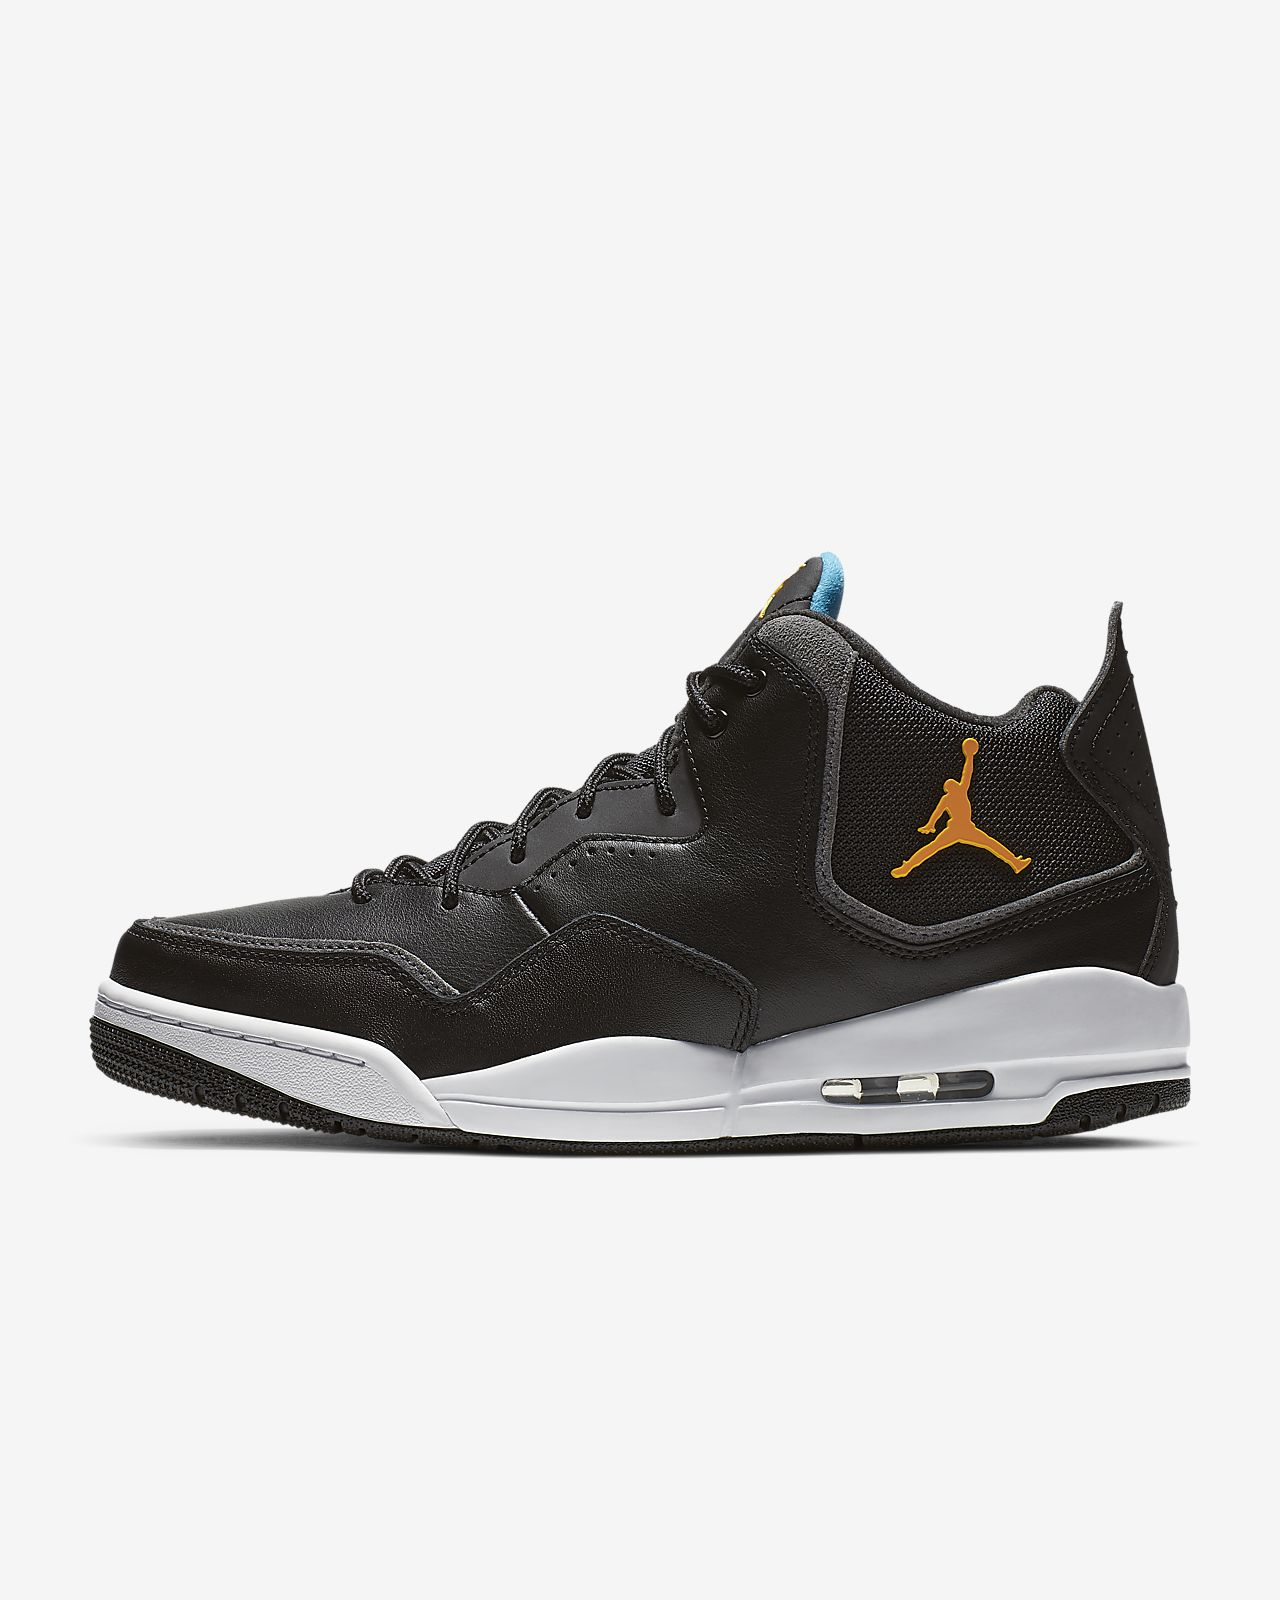 Pánská bota Jordan Courtside 23. Nike.com CZ 71a635ee26